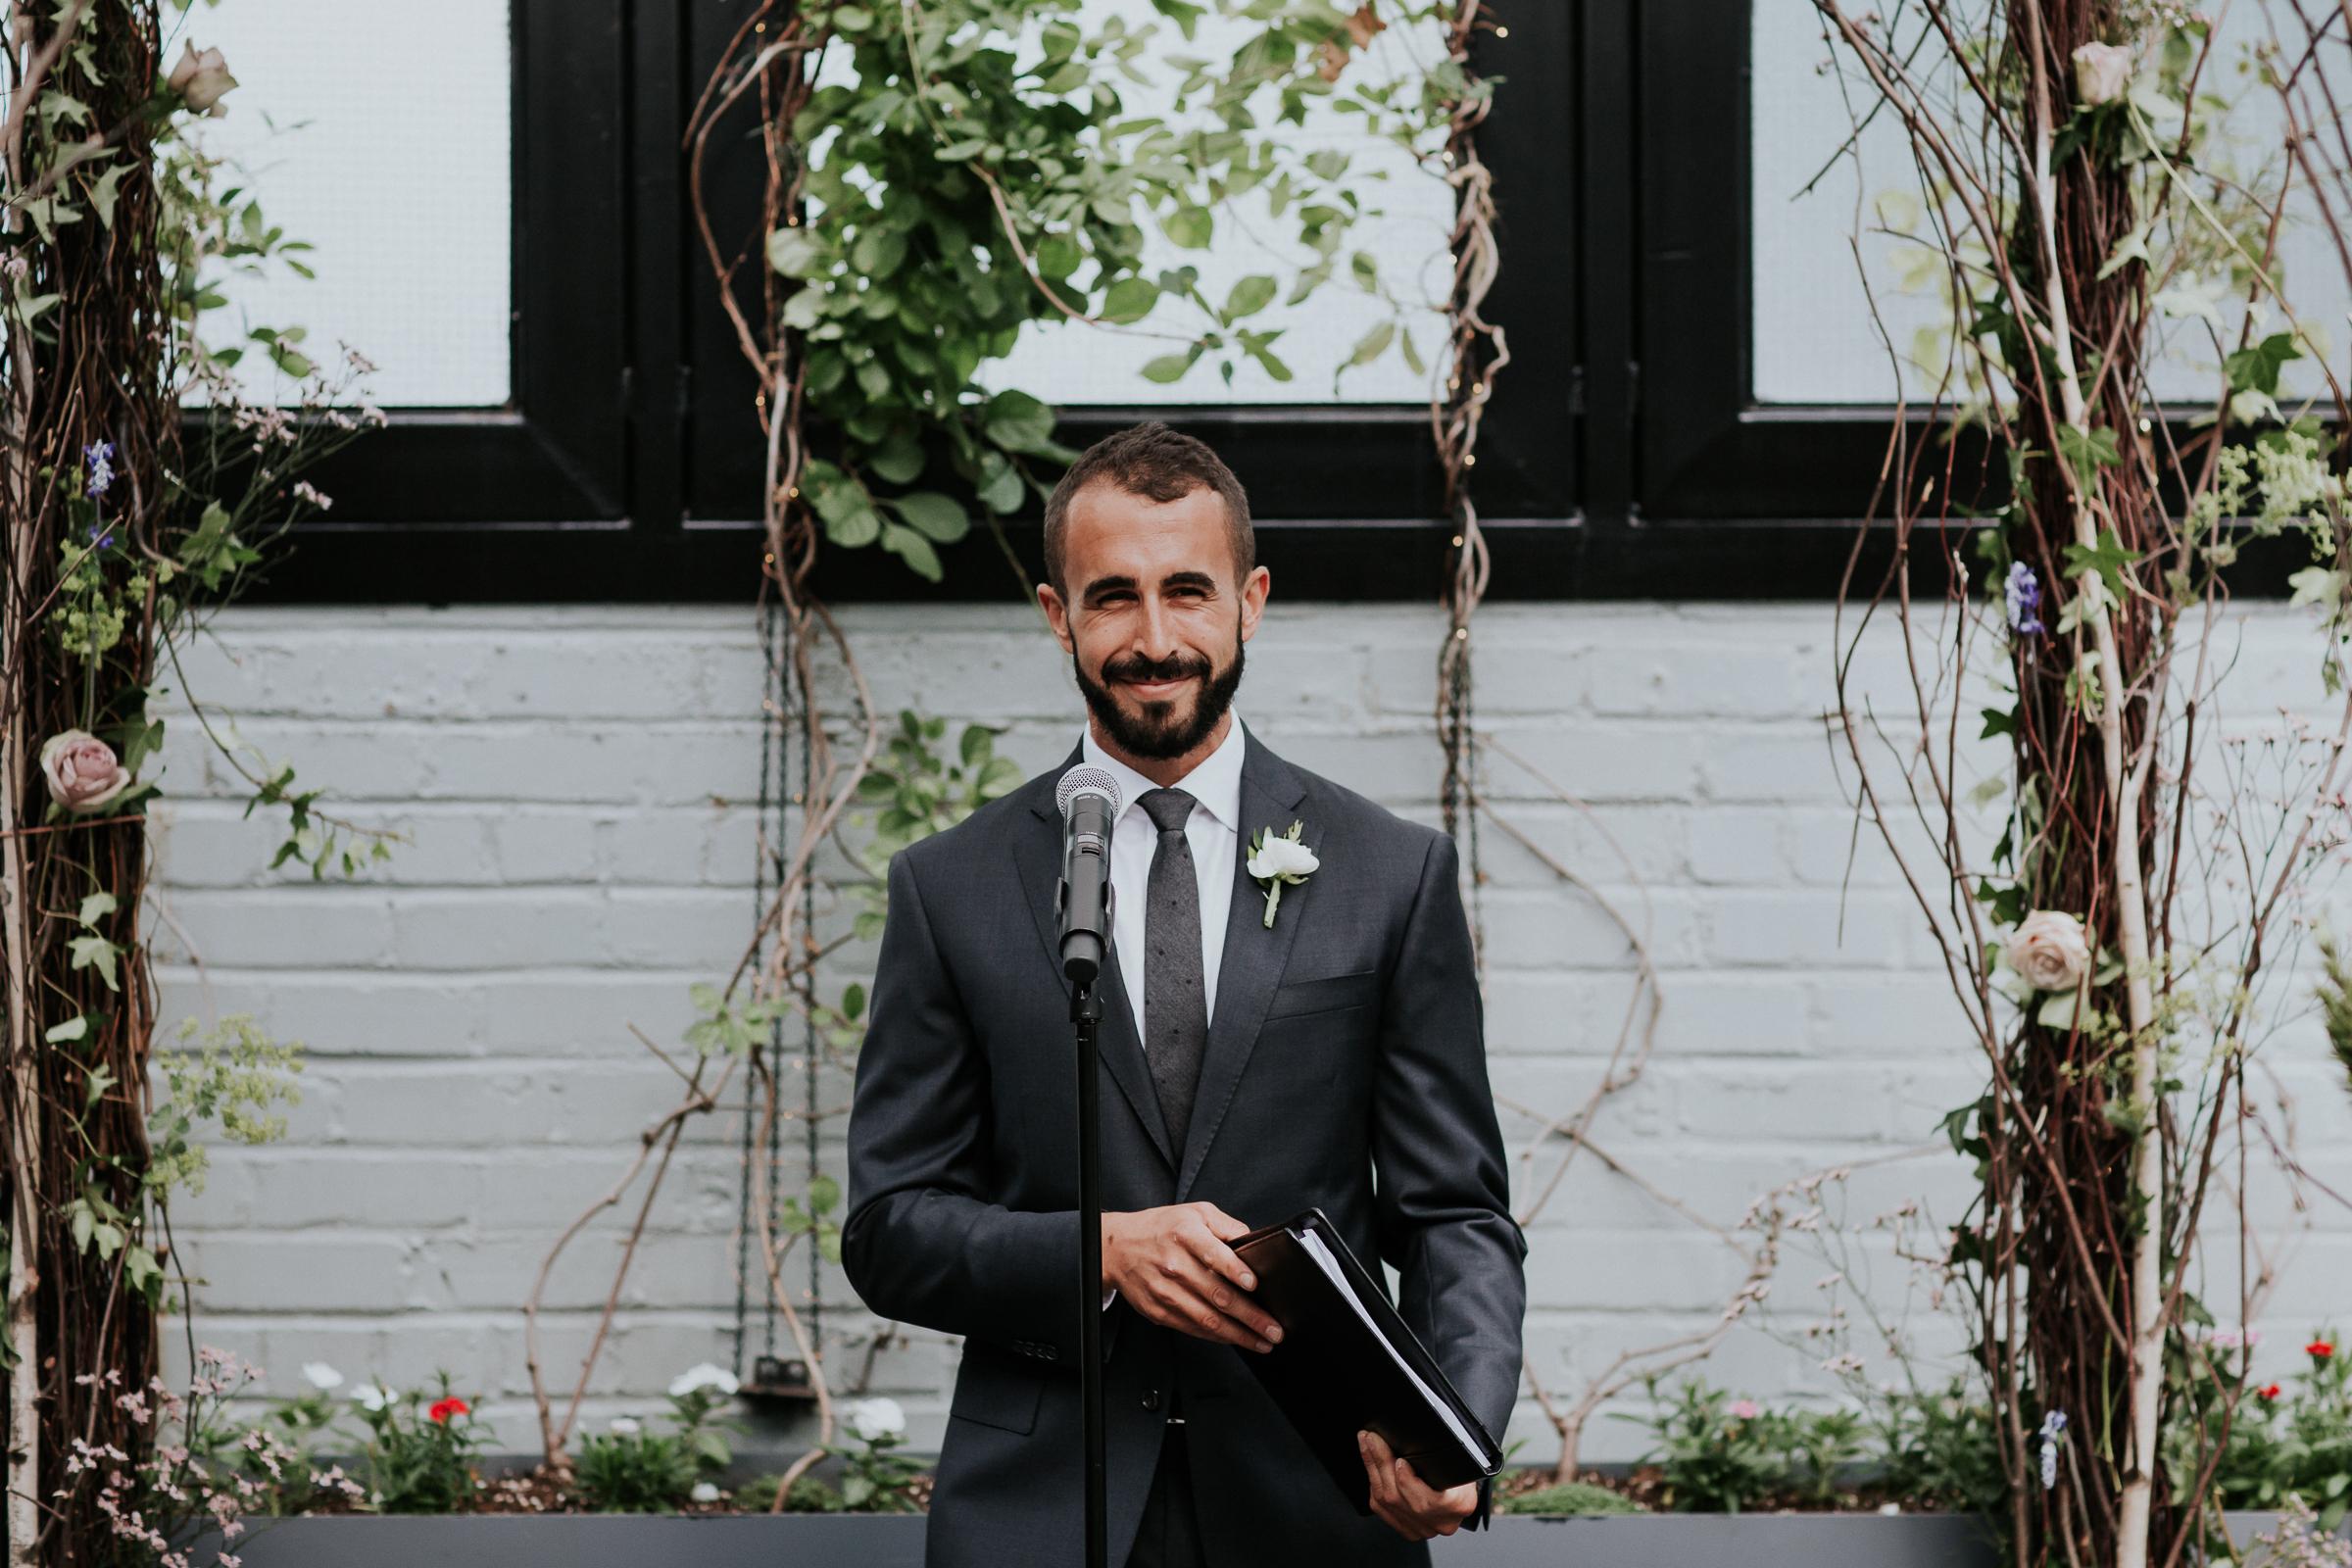 501-Union-Brooklyn-Fine-Art-Documentary-Wedding-Photographer-78.jpg